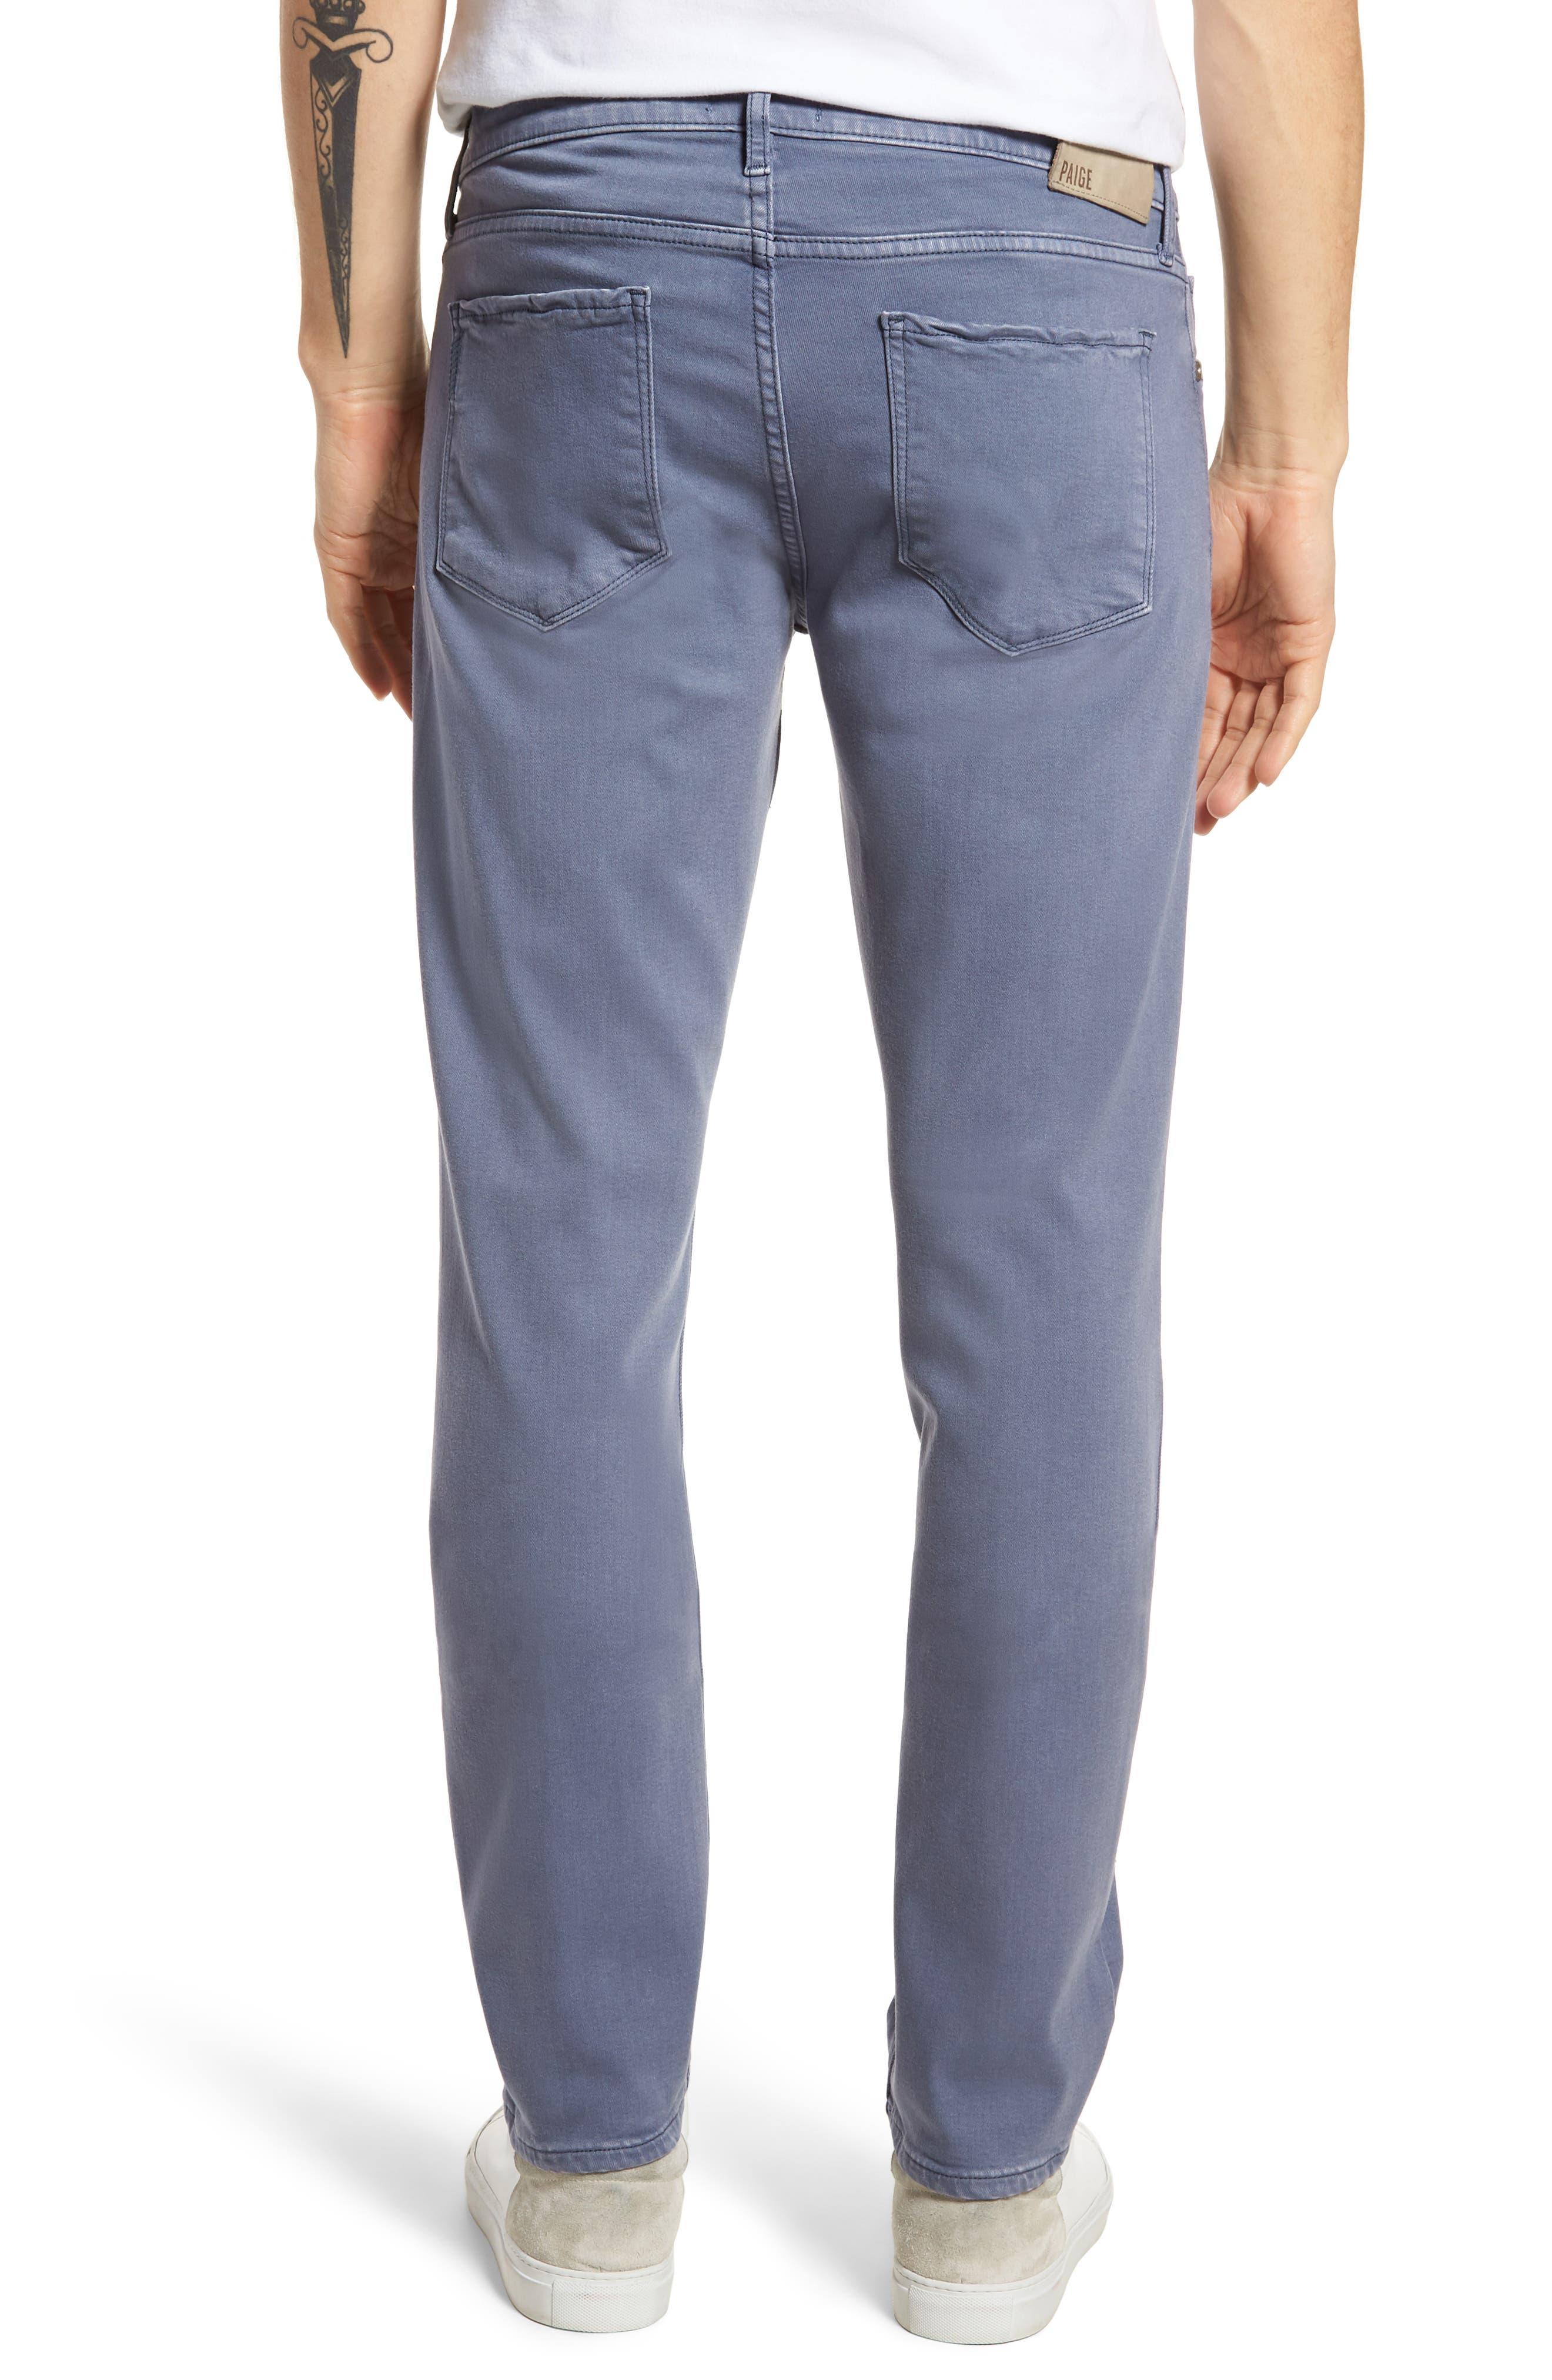 Transcend - Federal Slim Straight Leg Jeans,                             Alternate thumbnail 2, color,                             Vintage Smokey Blue